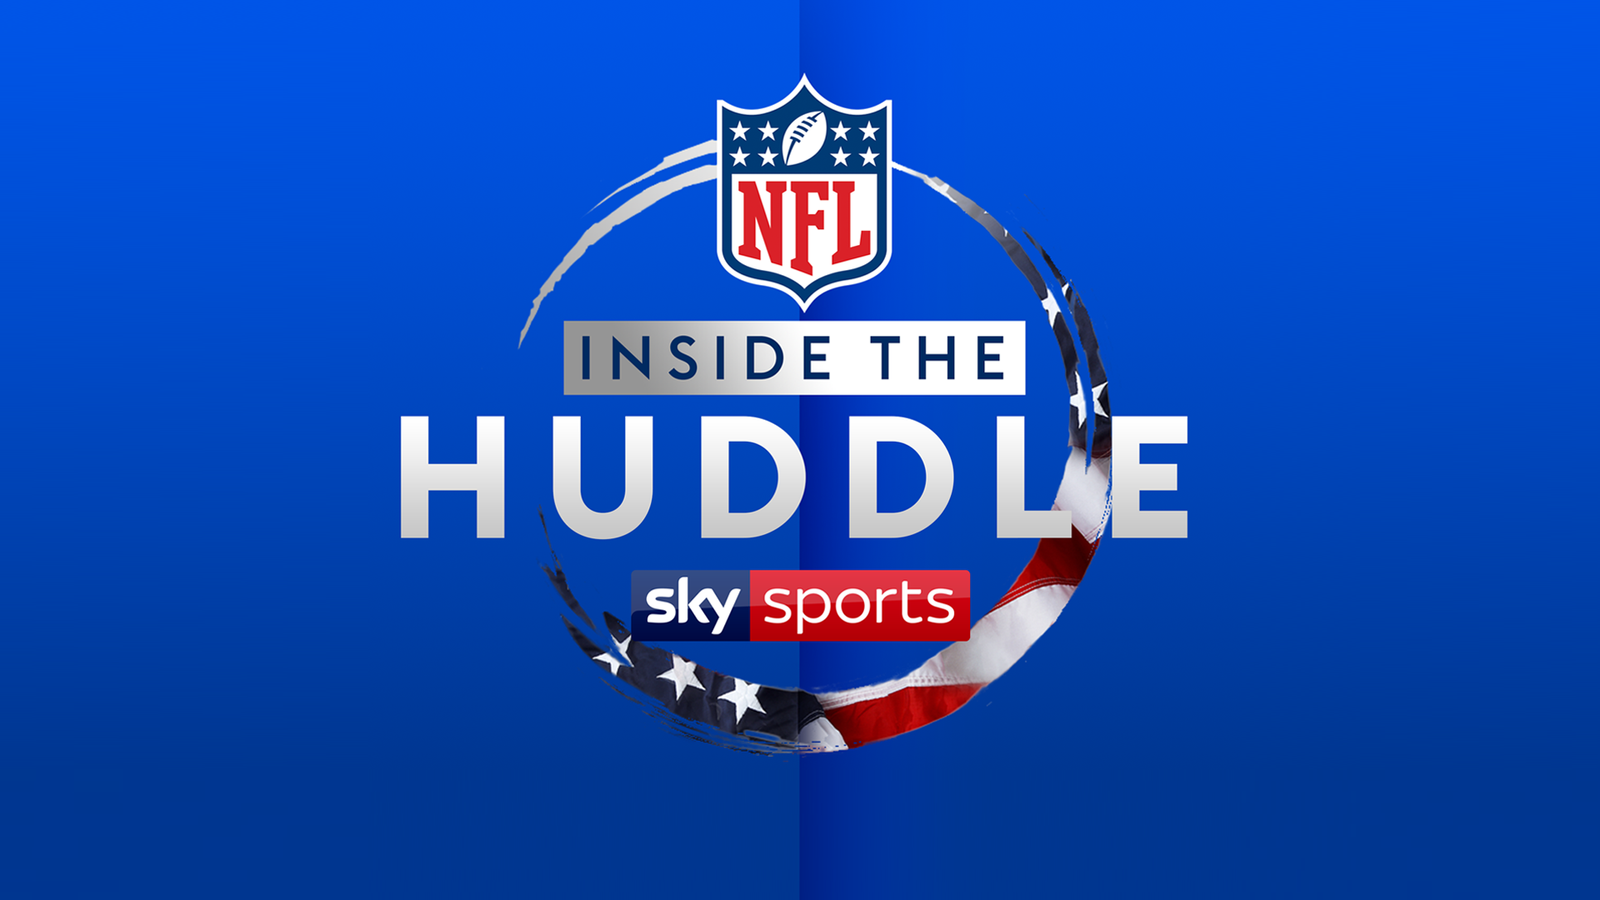 Inside The Huddle Christmas Special: Neil Reynolds, Jeff Reinebold and Brian Baldinger